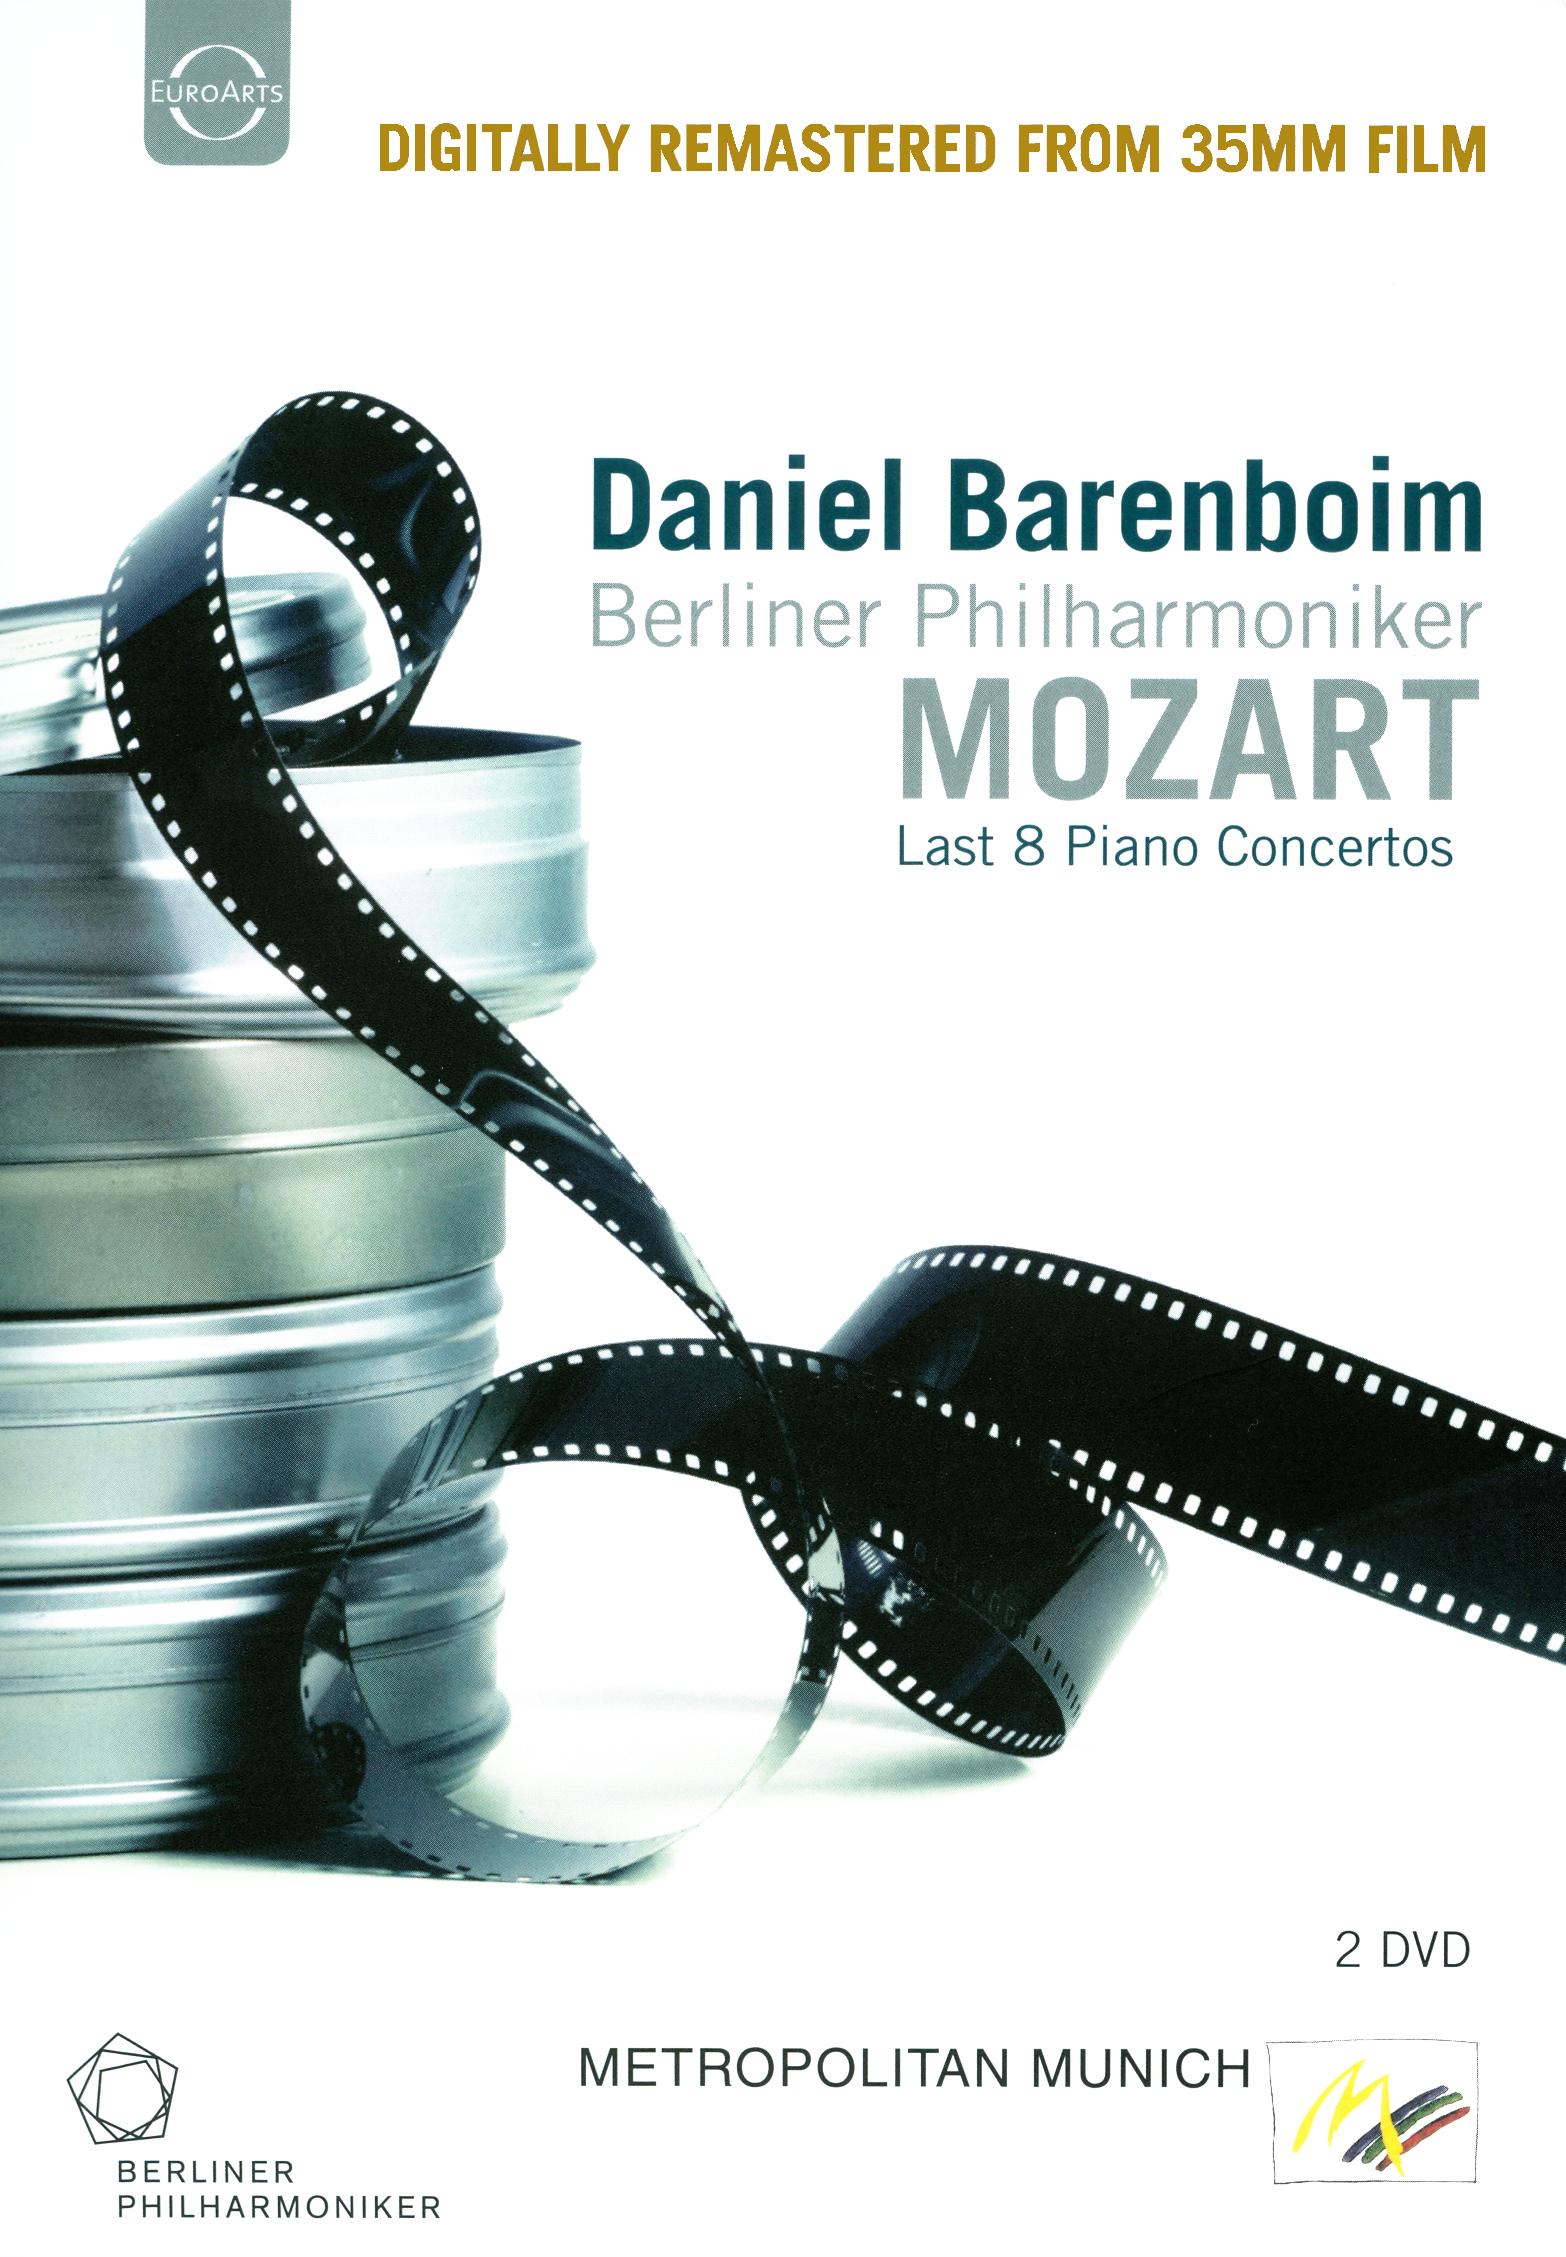 Daniel Barenboim/Berliner Philharmoniker: Mozart - Last 8 Piano Concertos